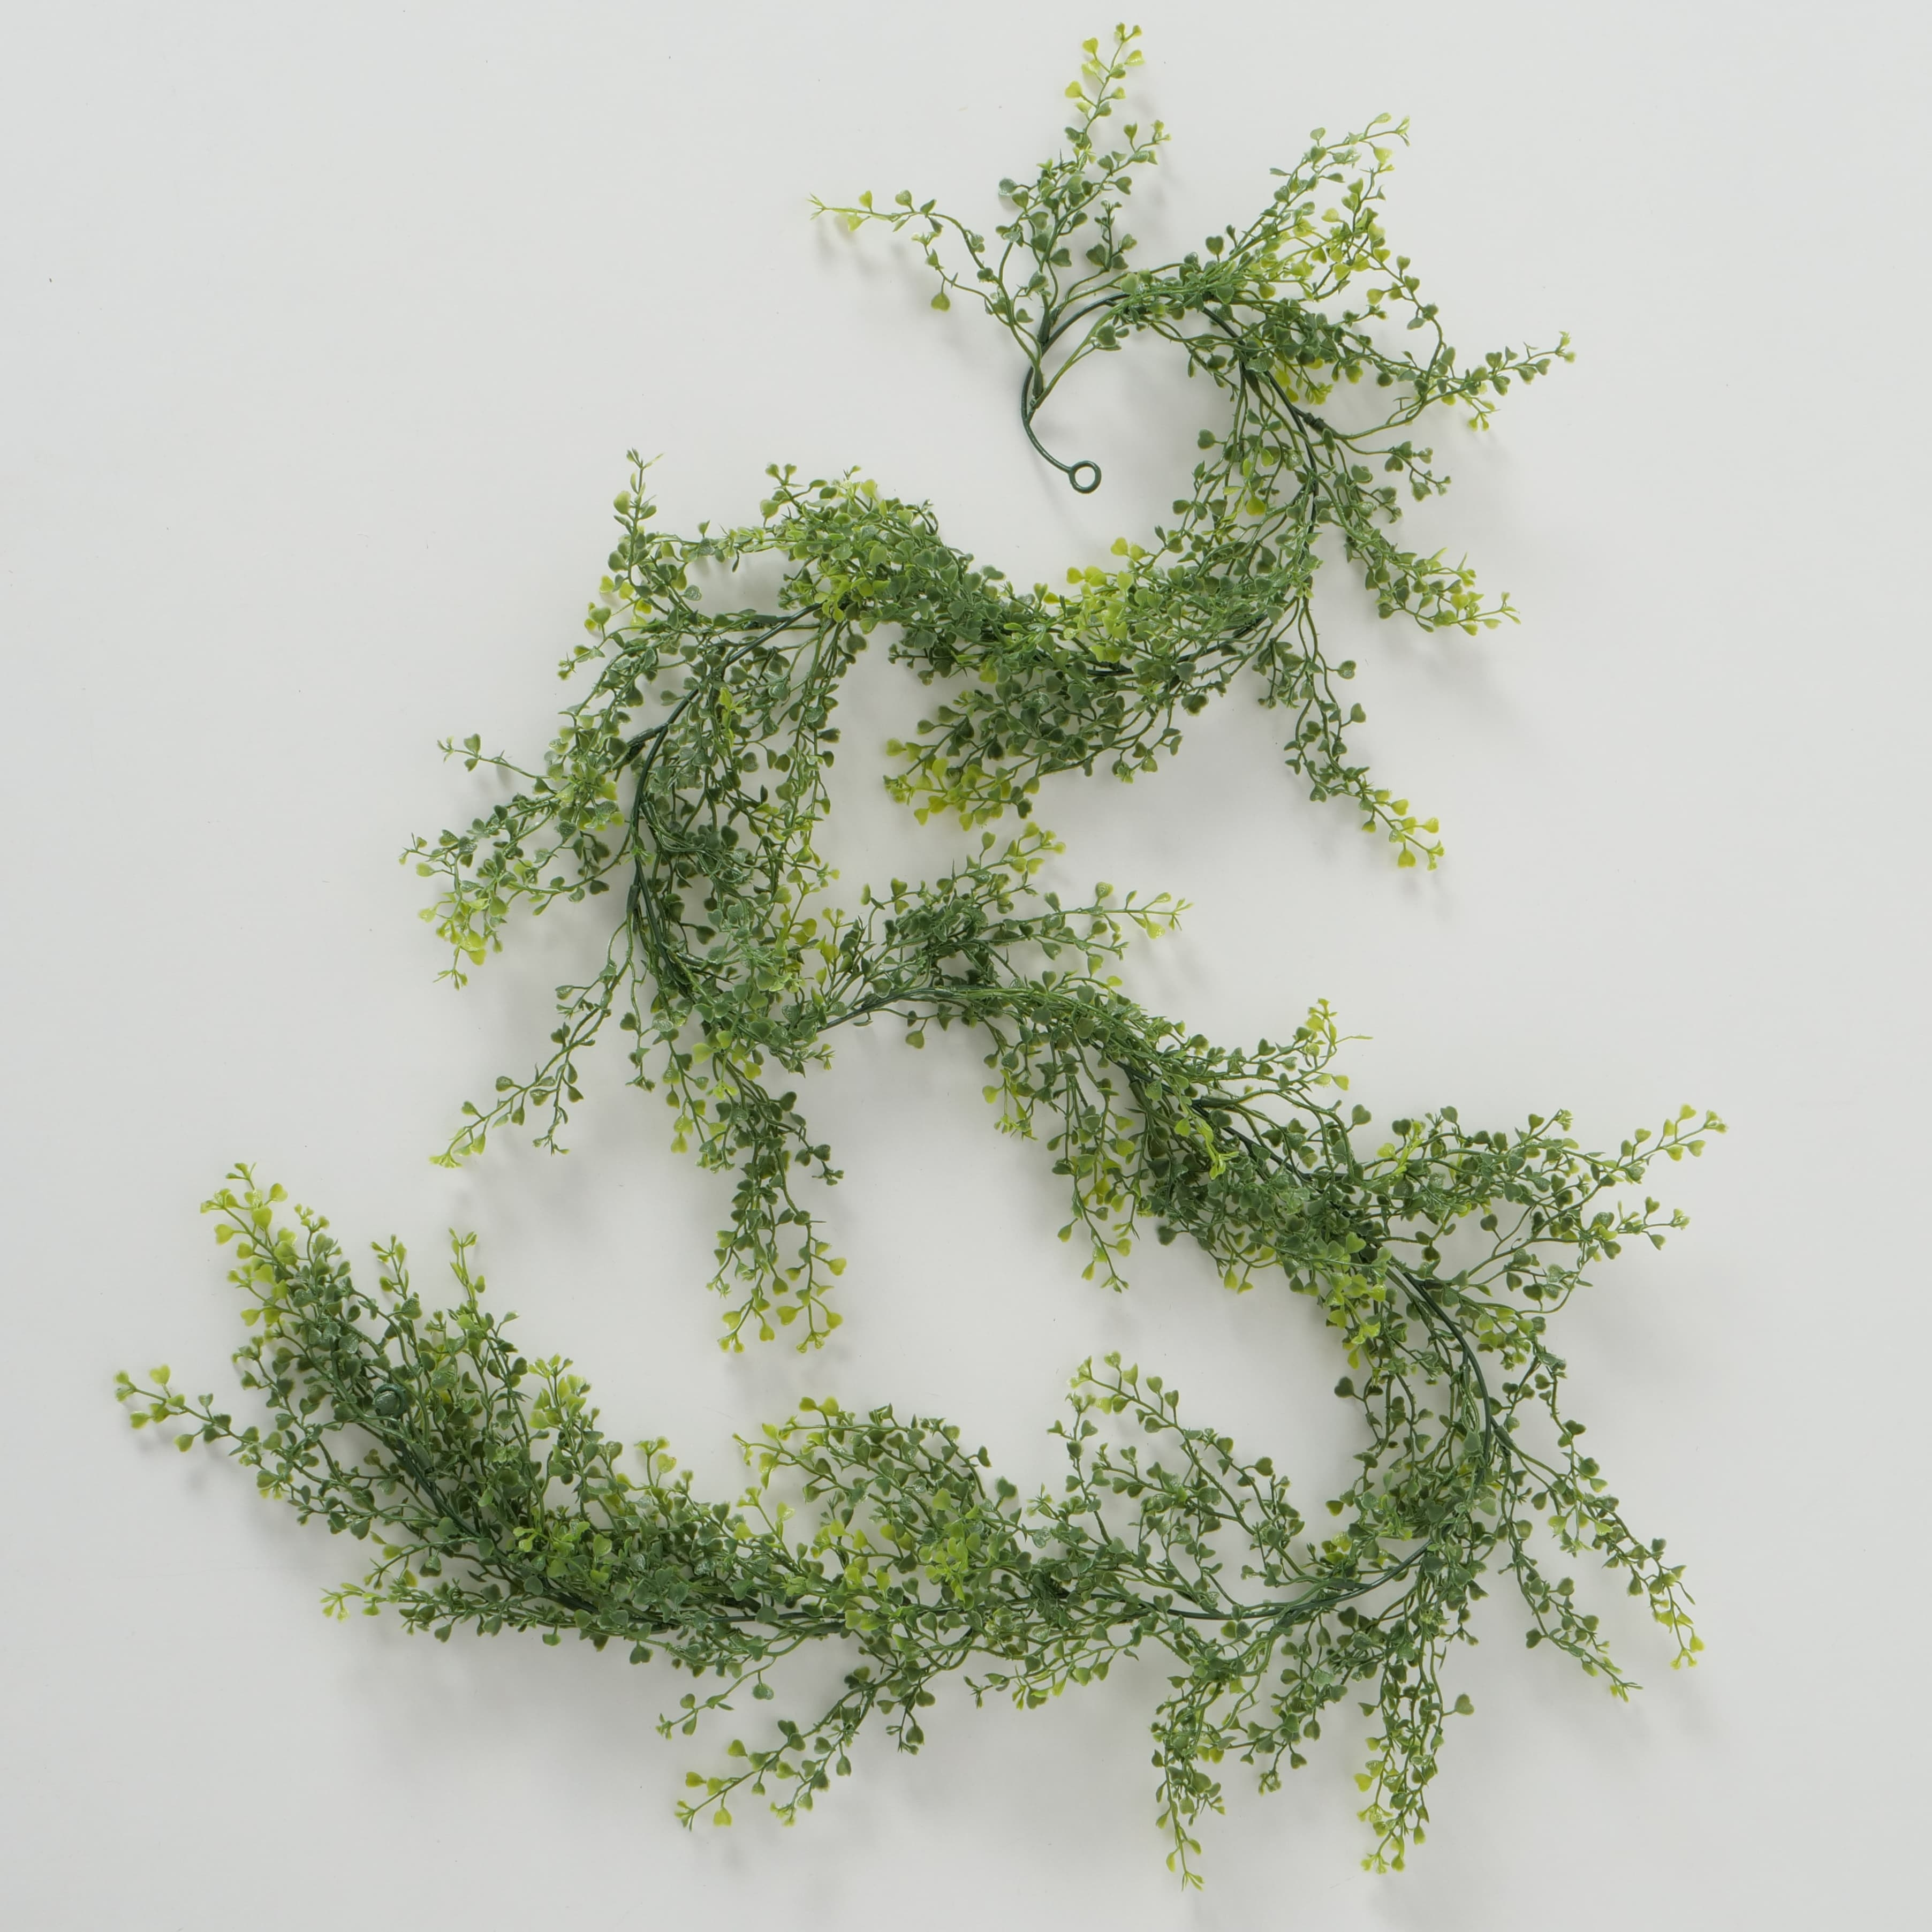 Ghirlanda decorativa din frunze artificiale Greenish Phyllanthus Verde, L170 cm imagine